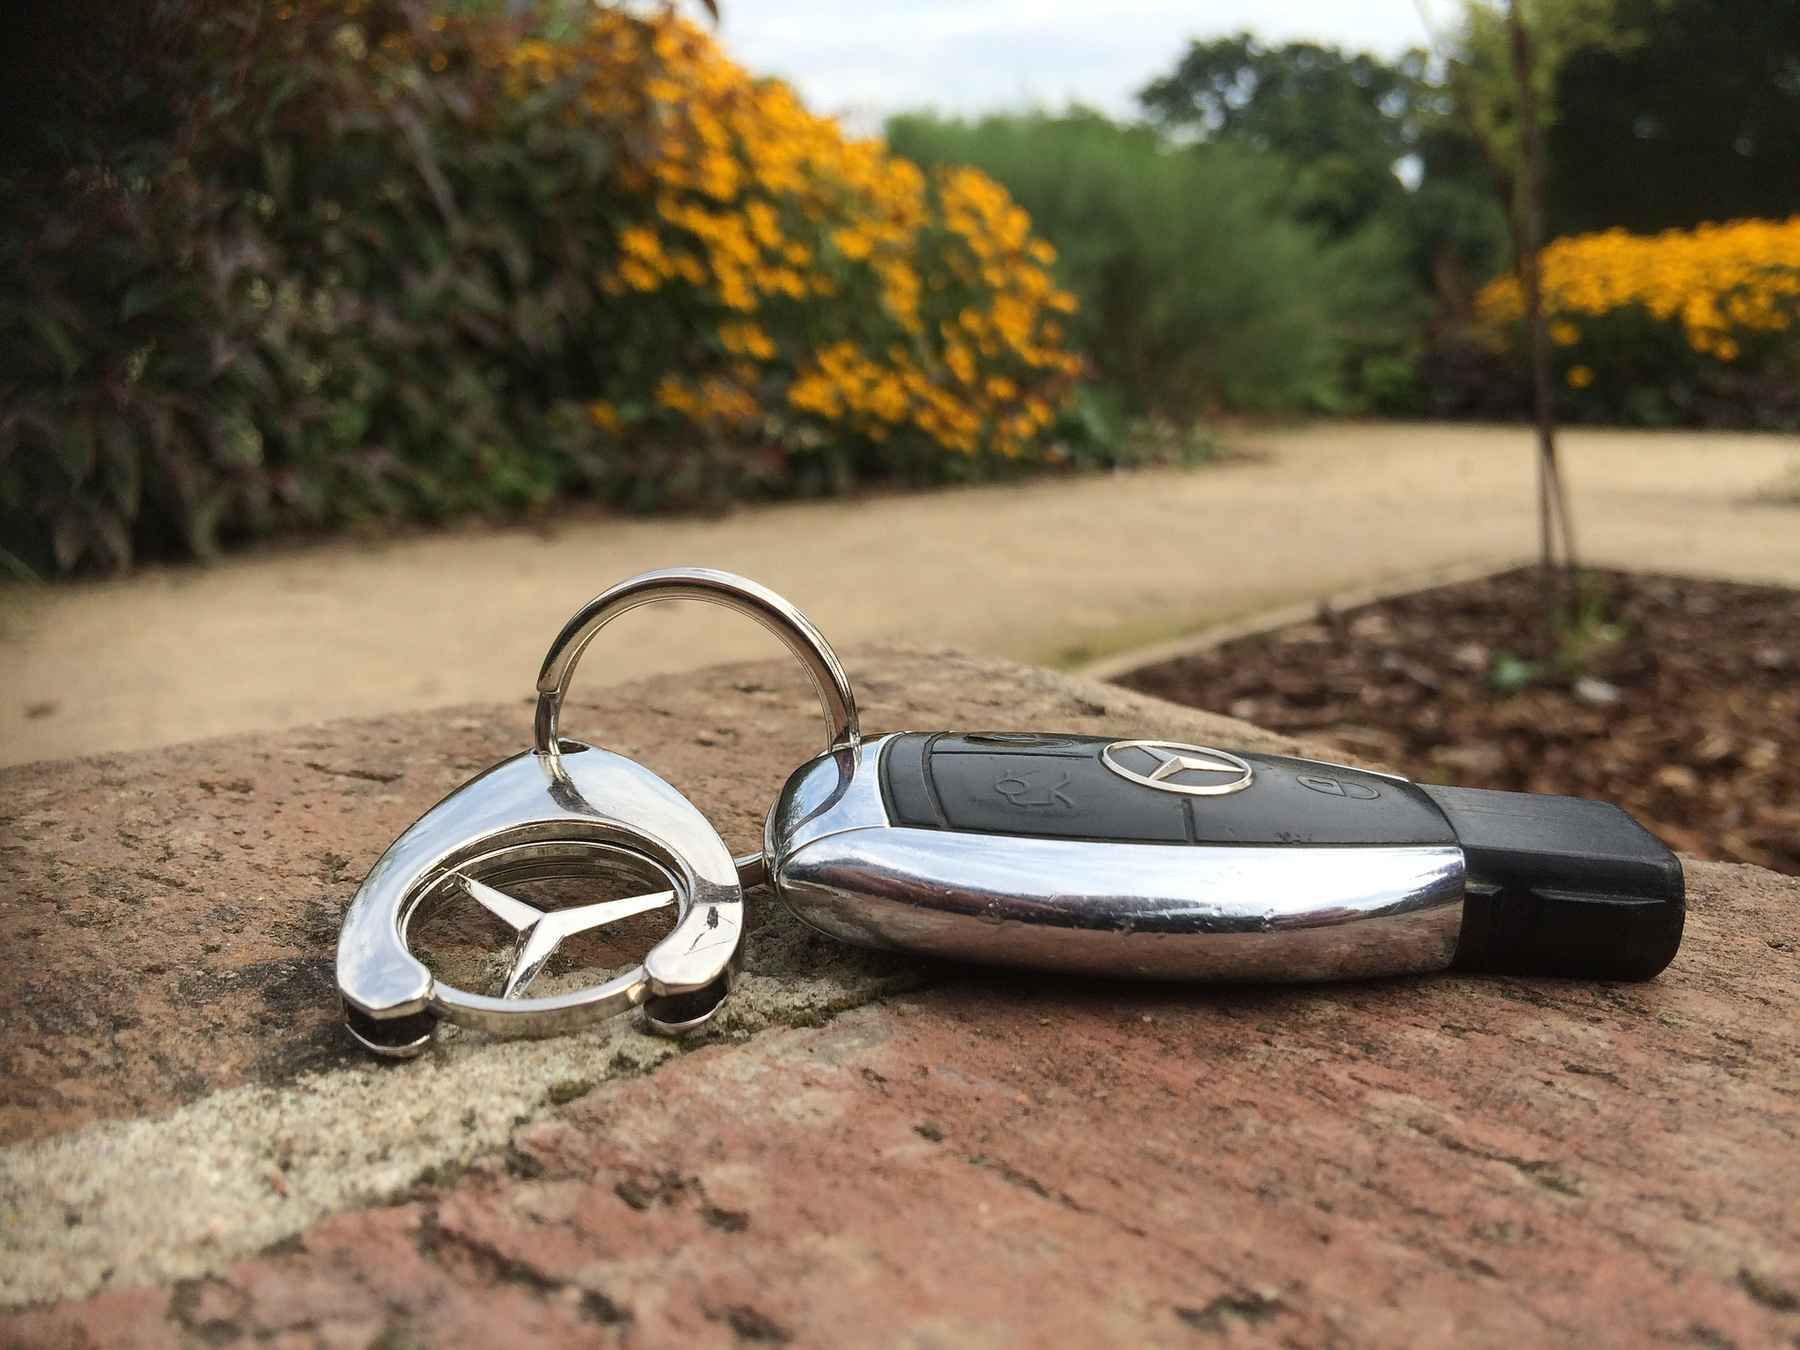 Verlorener Autoschlüssel im Park